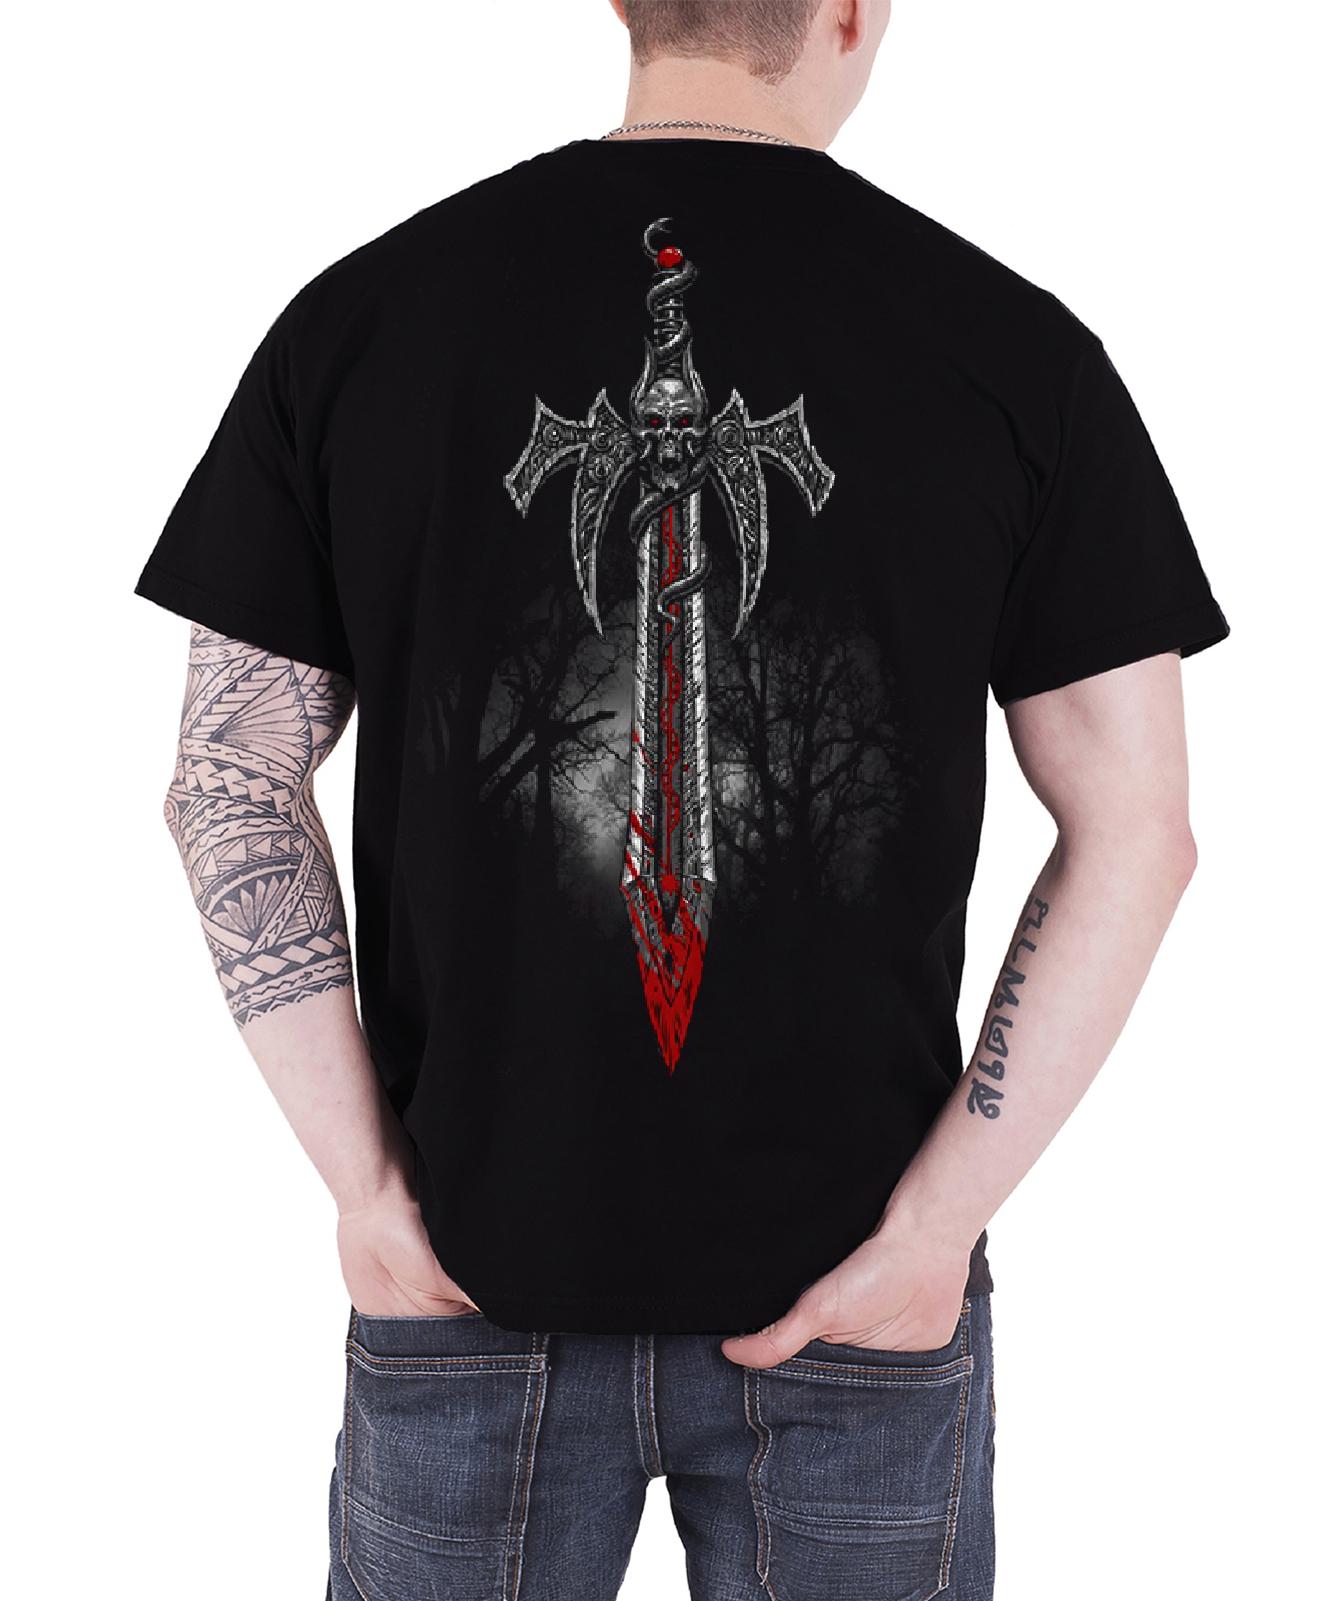 Black sabbath t shirt iron man - Trivium T Shirt Silence In The Snow In